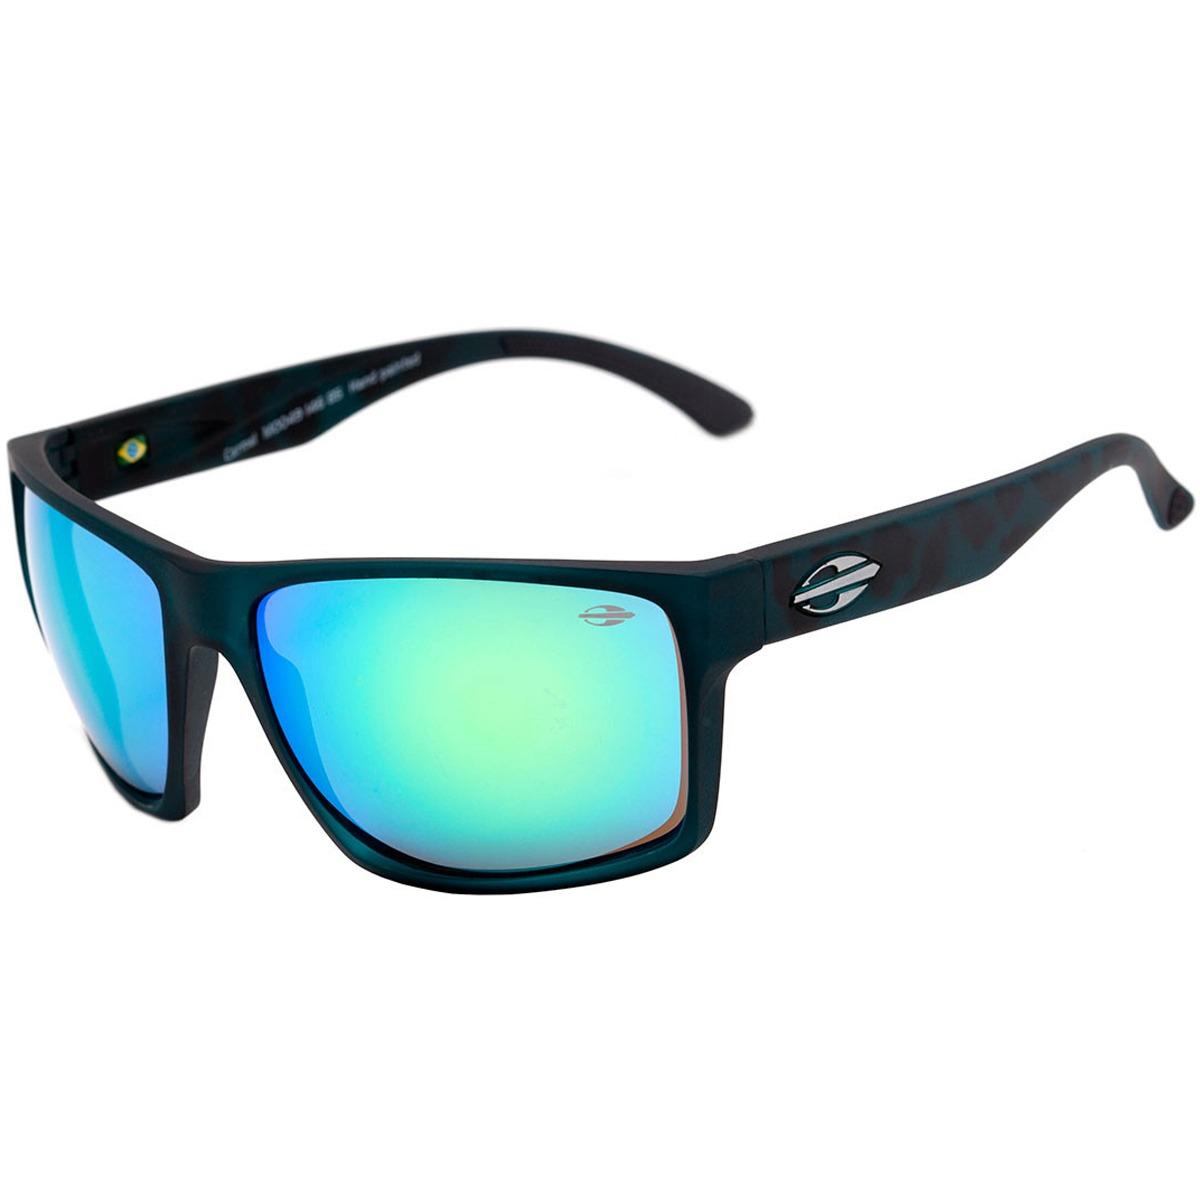 334944c4f7c6a óculos mormaii carmel. Carregando zoom.